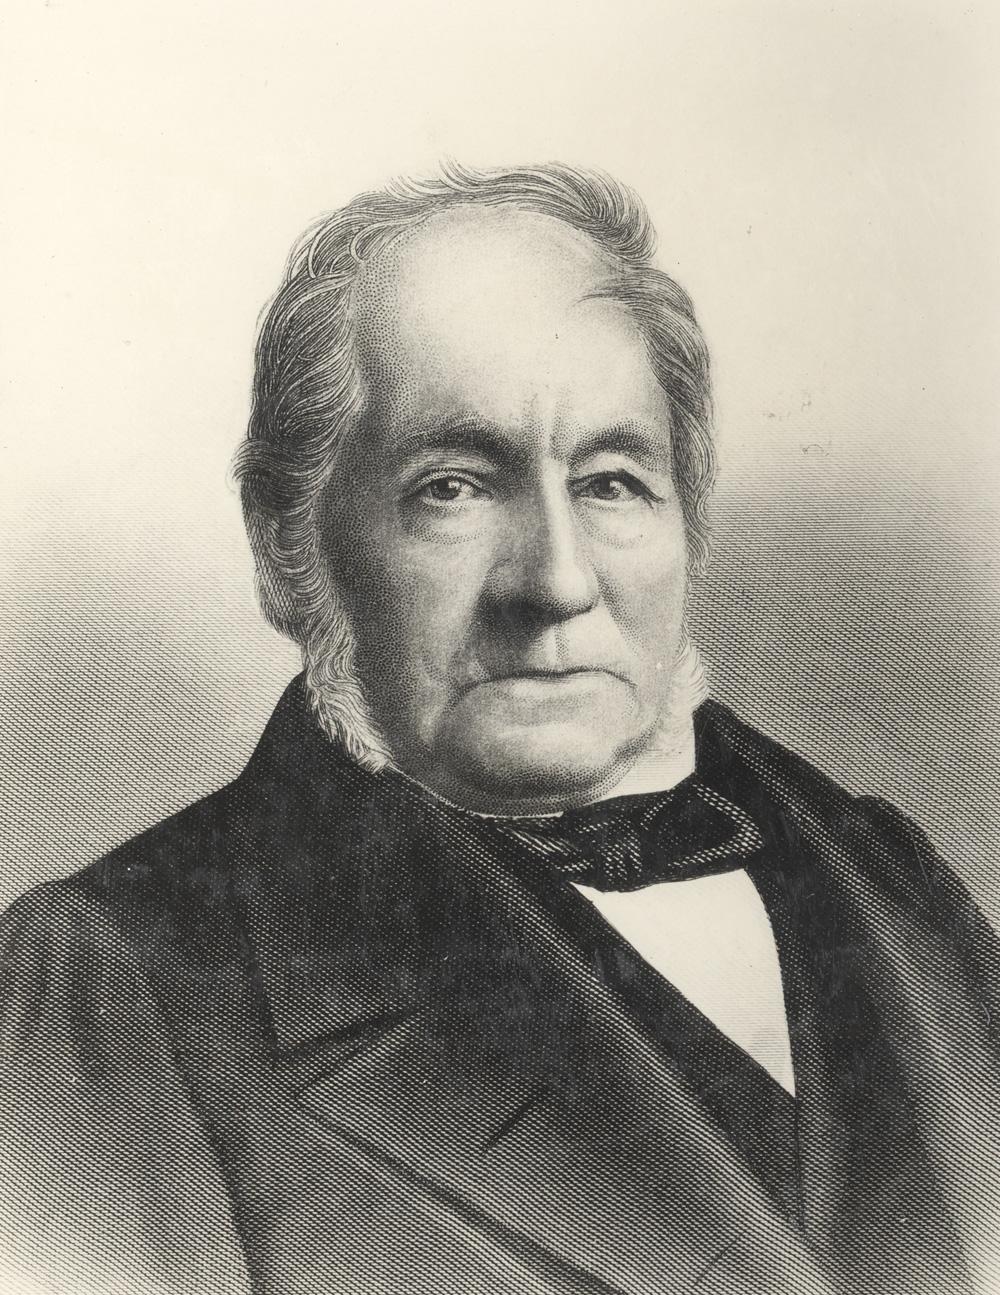 James Arnold